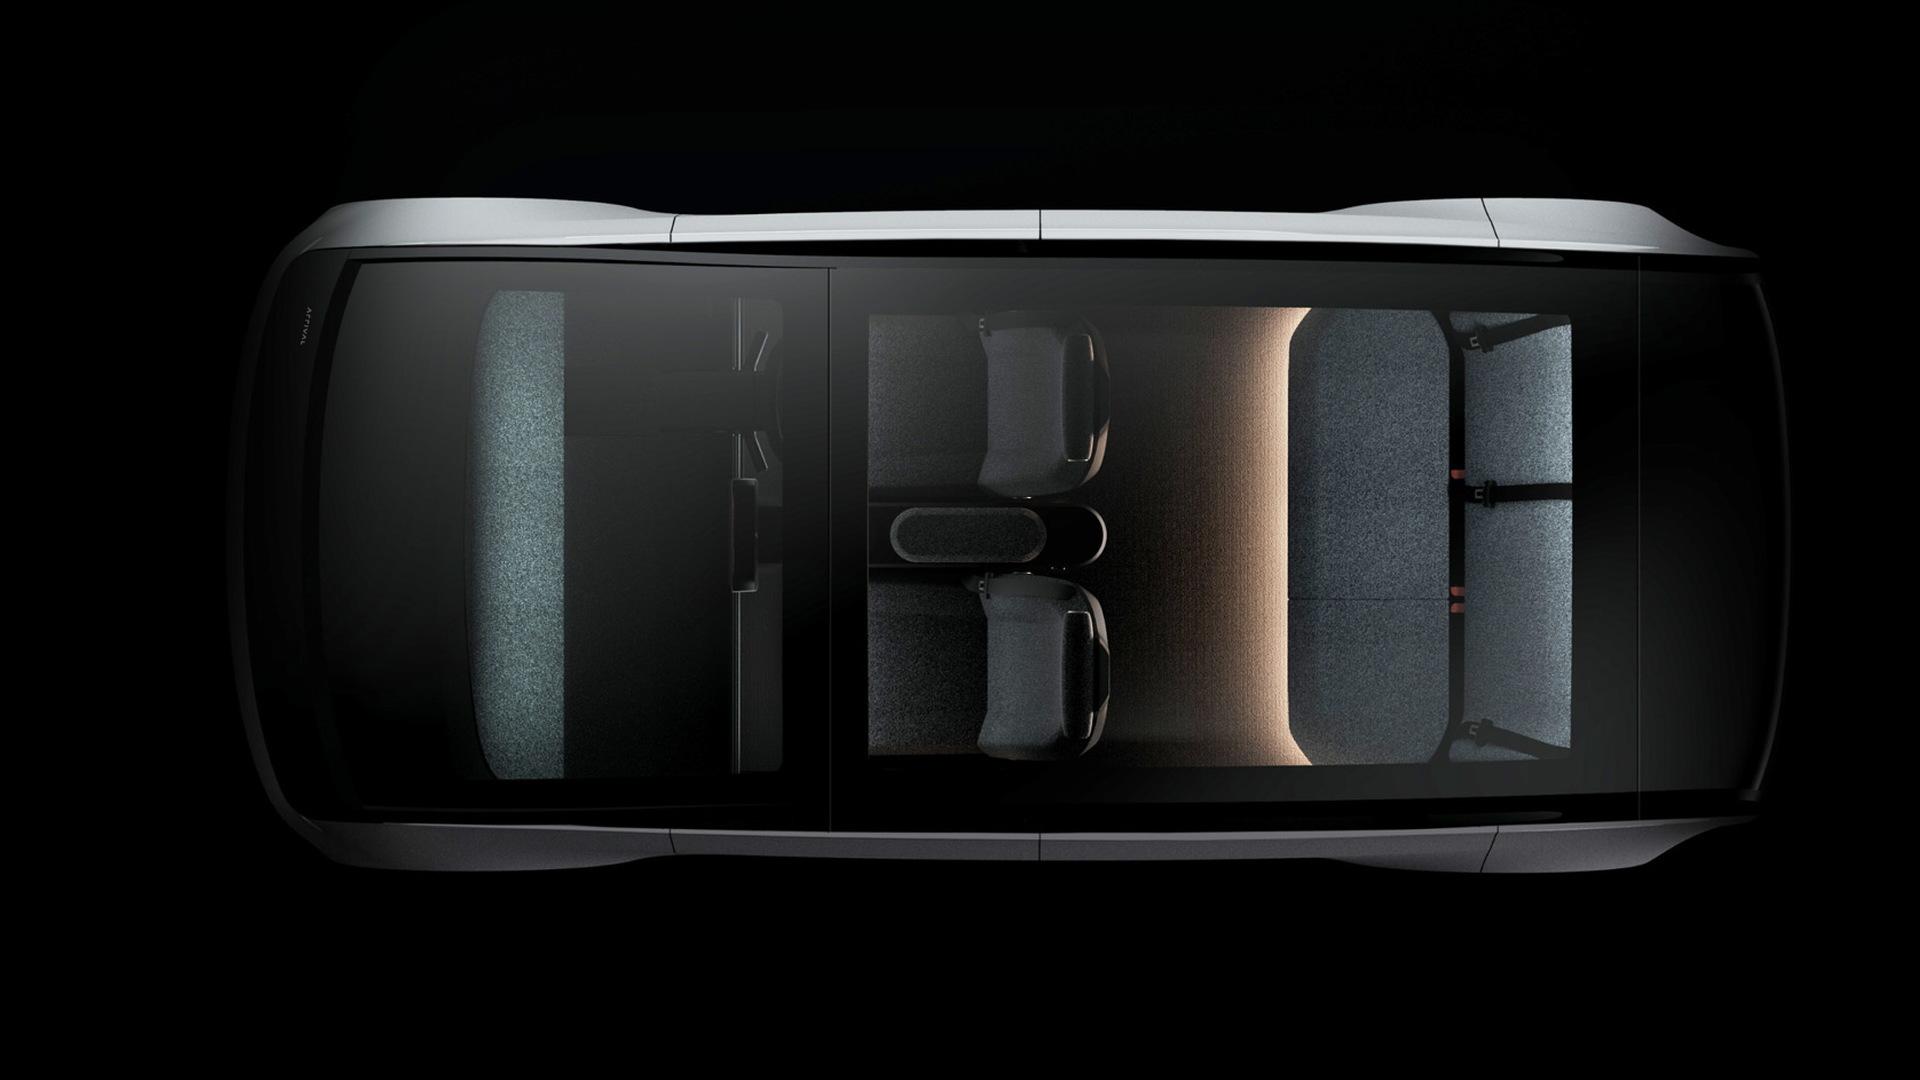 Teaser for Arrival Car due in 2023